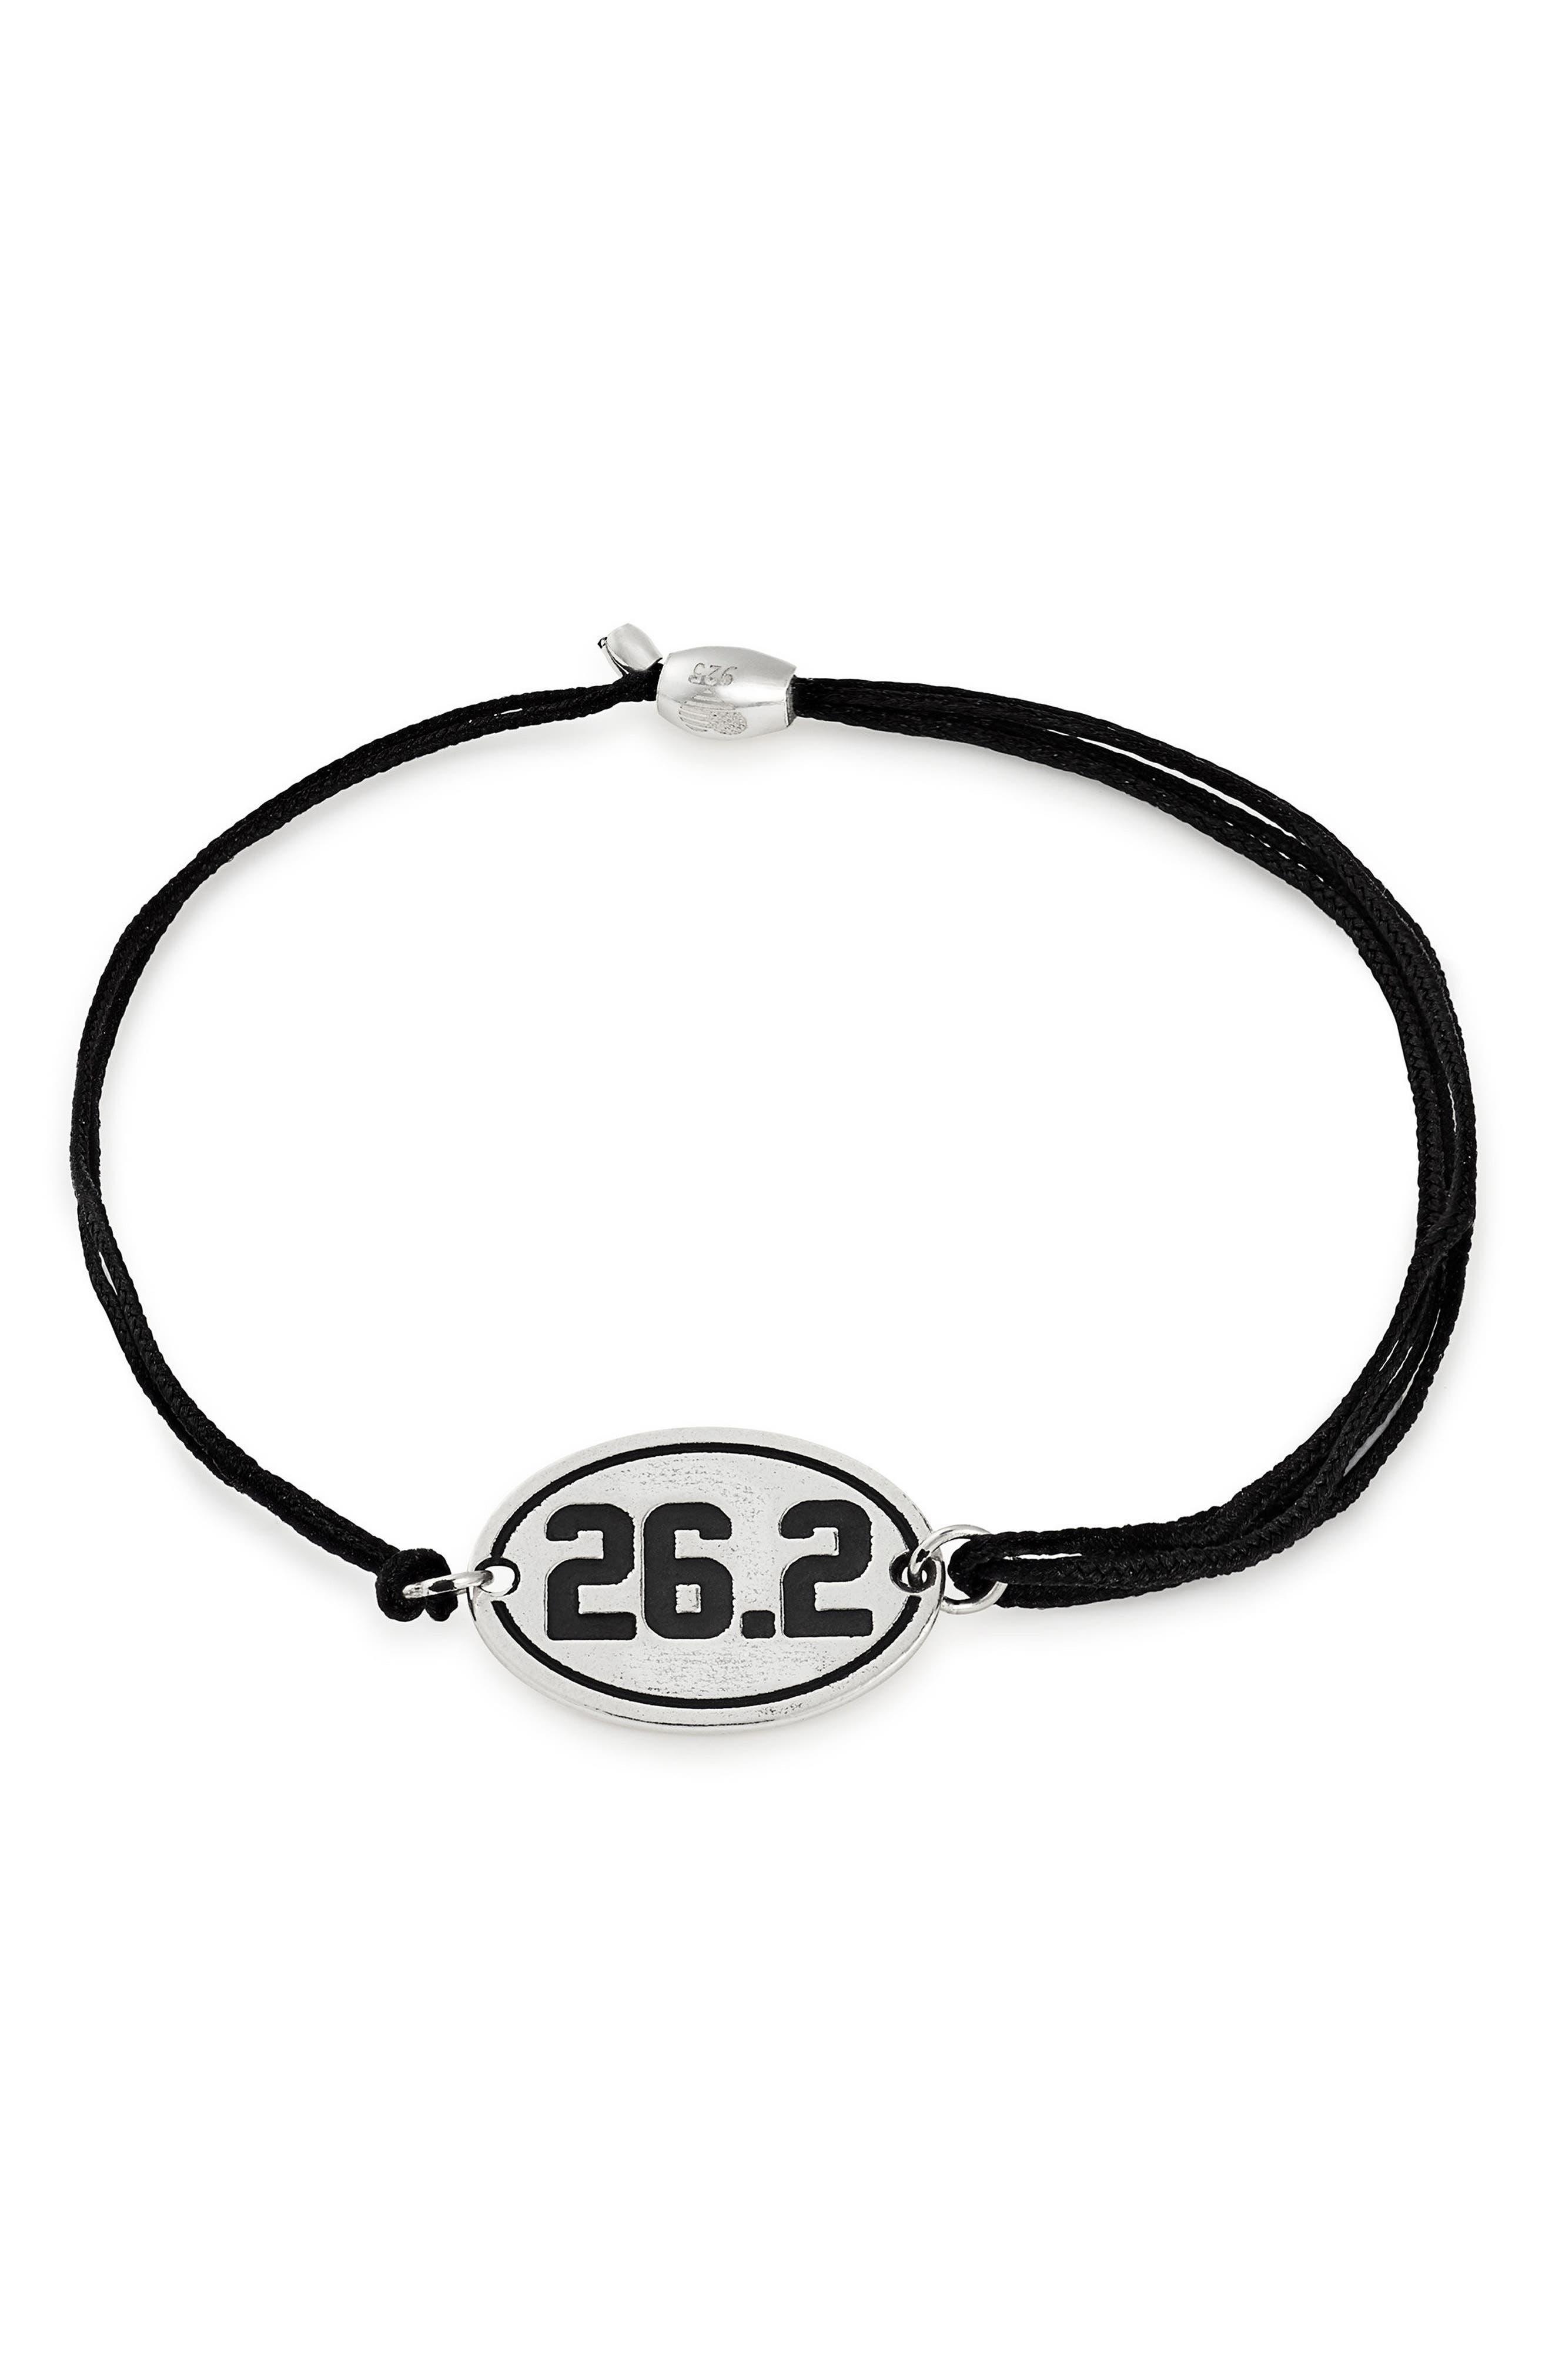 Kindred Cord Marathon 26.2 Bracelet,                             Main thumbnail 1, color,                             Silver